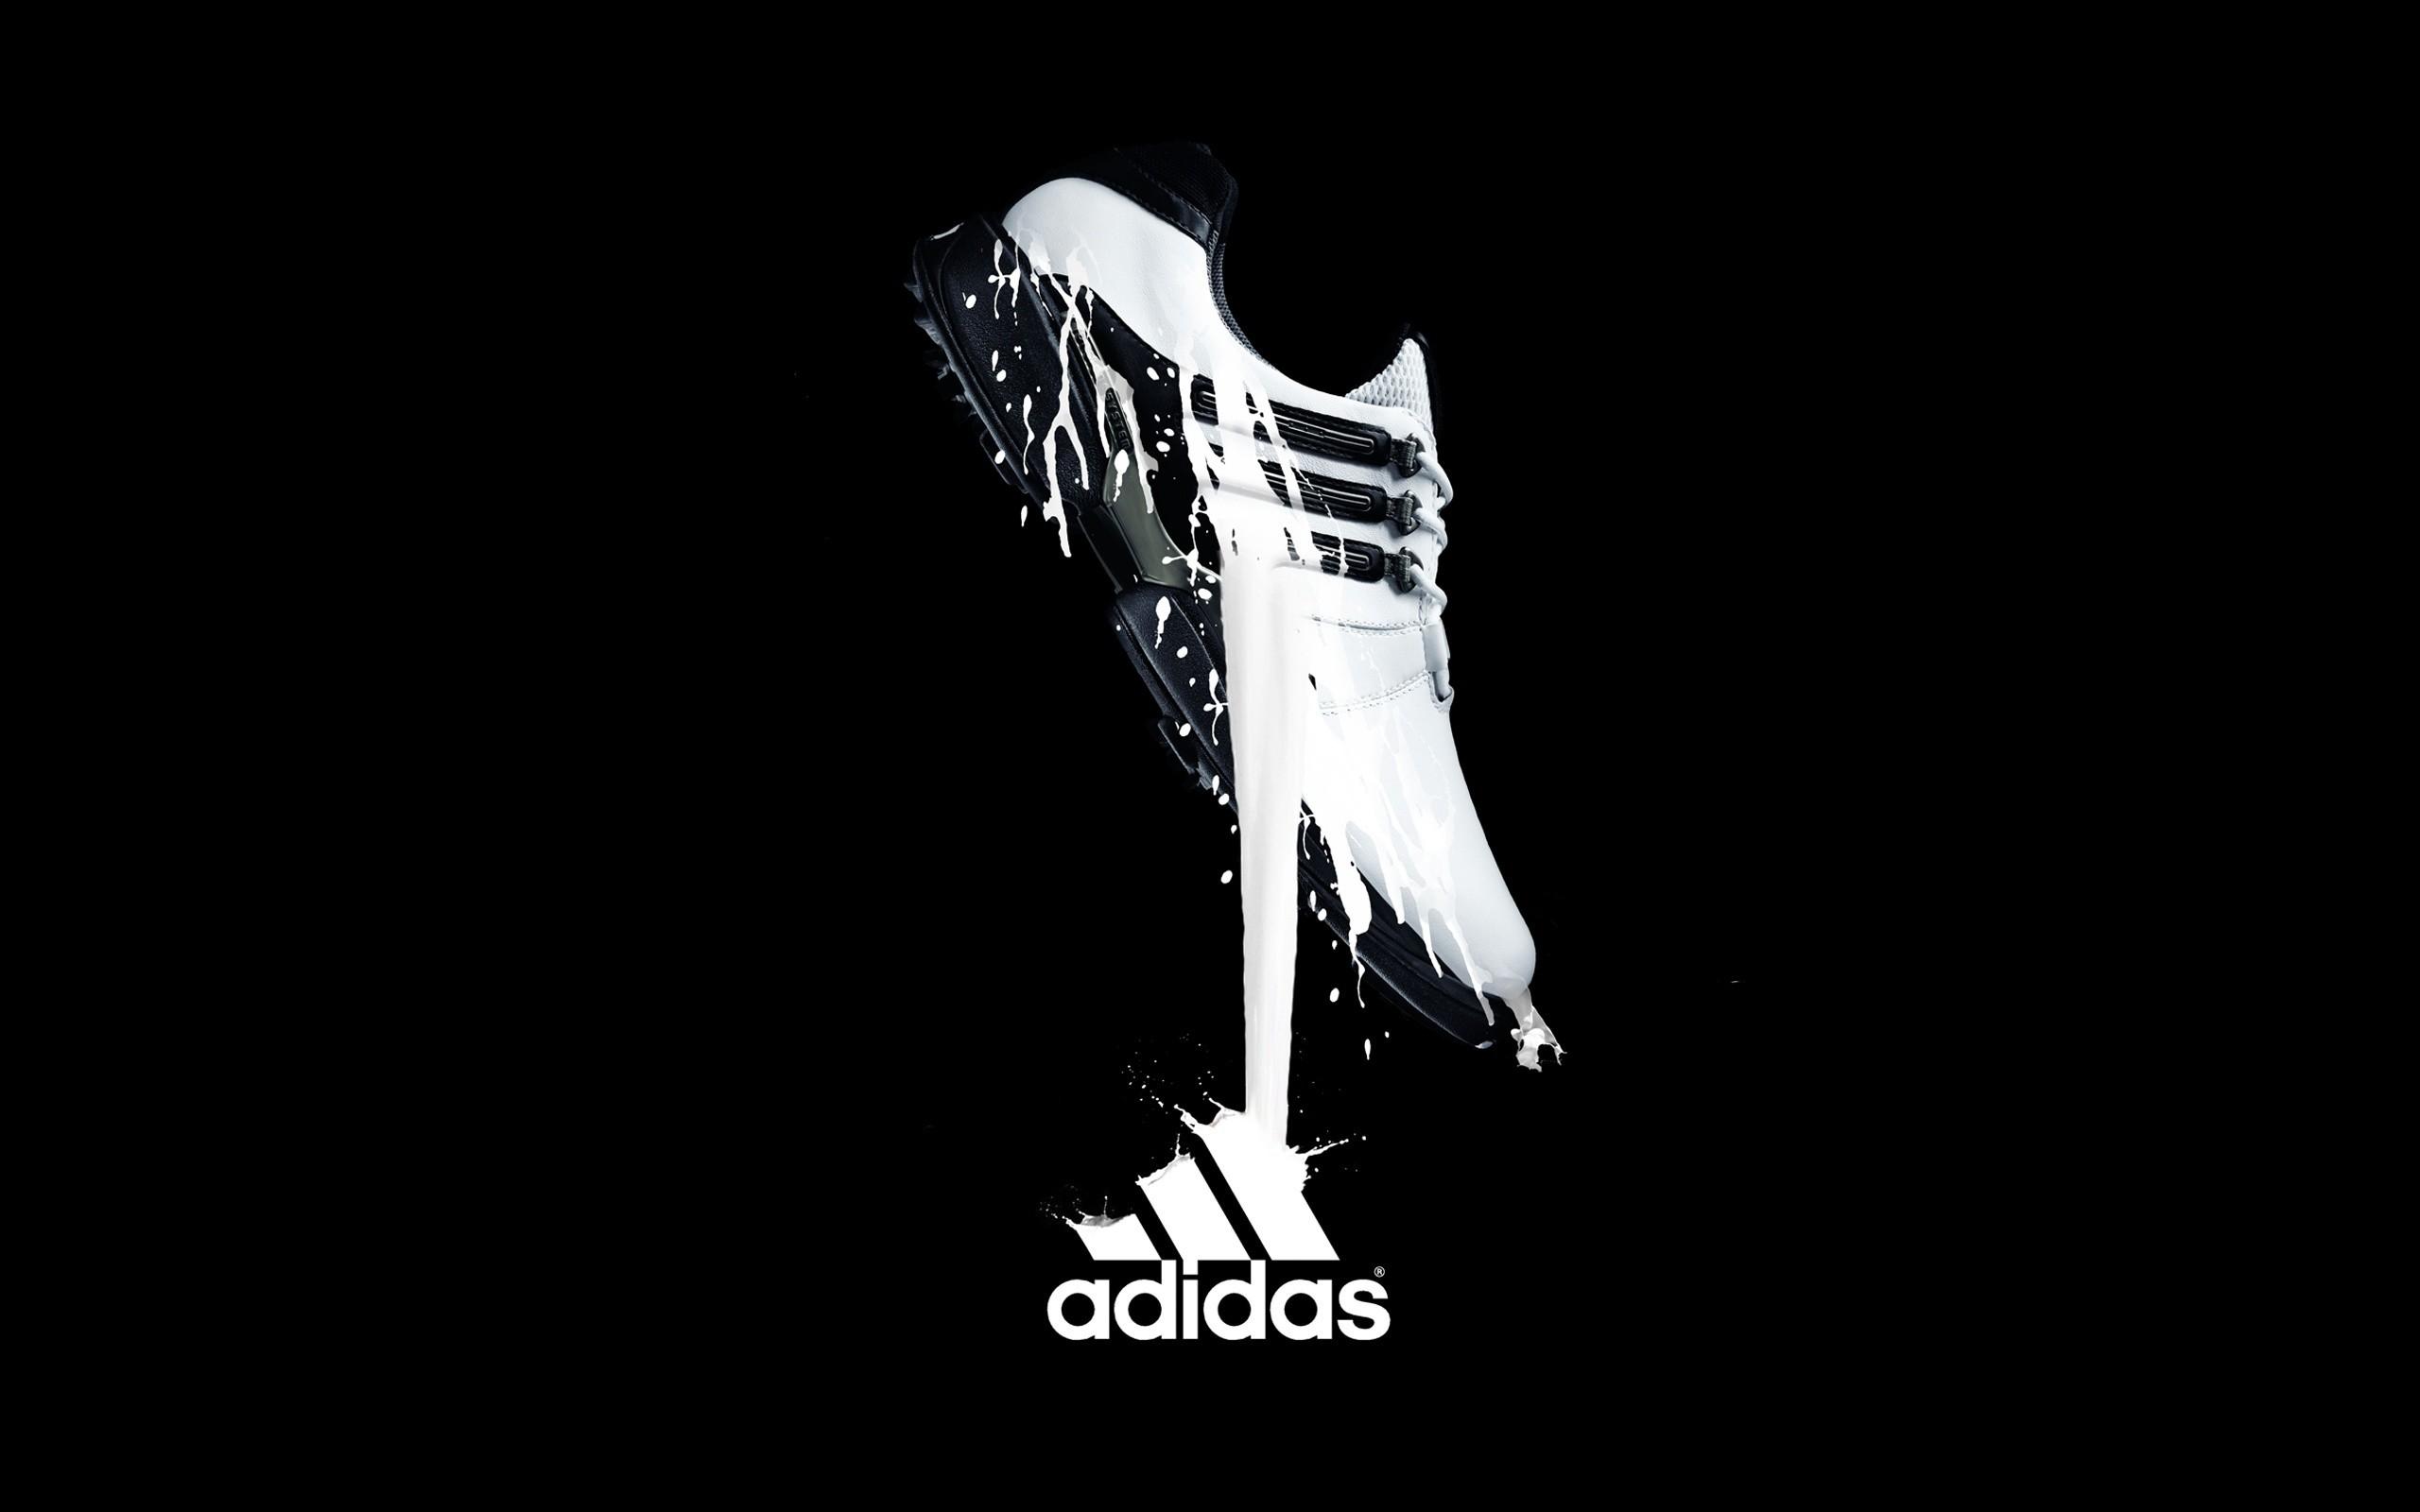 adidas wallpaper phone, wallpaper adidas